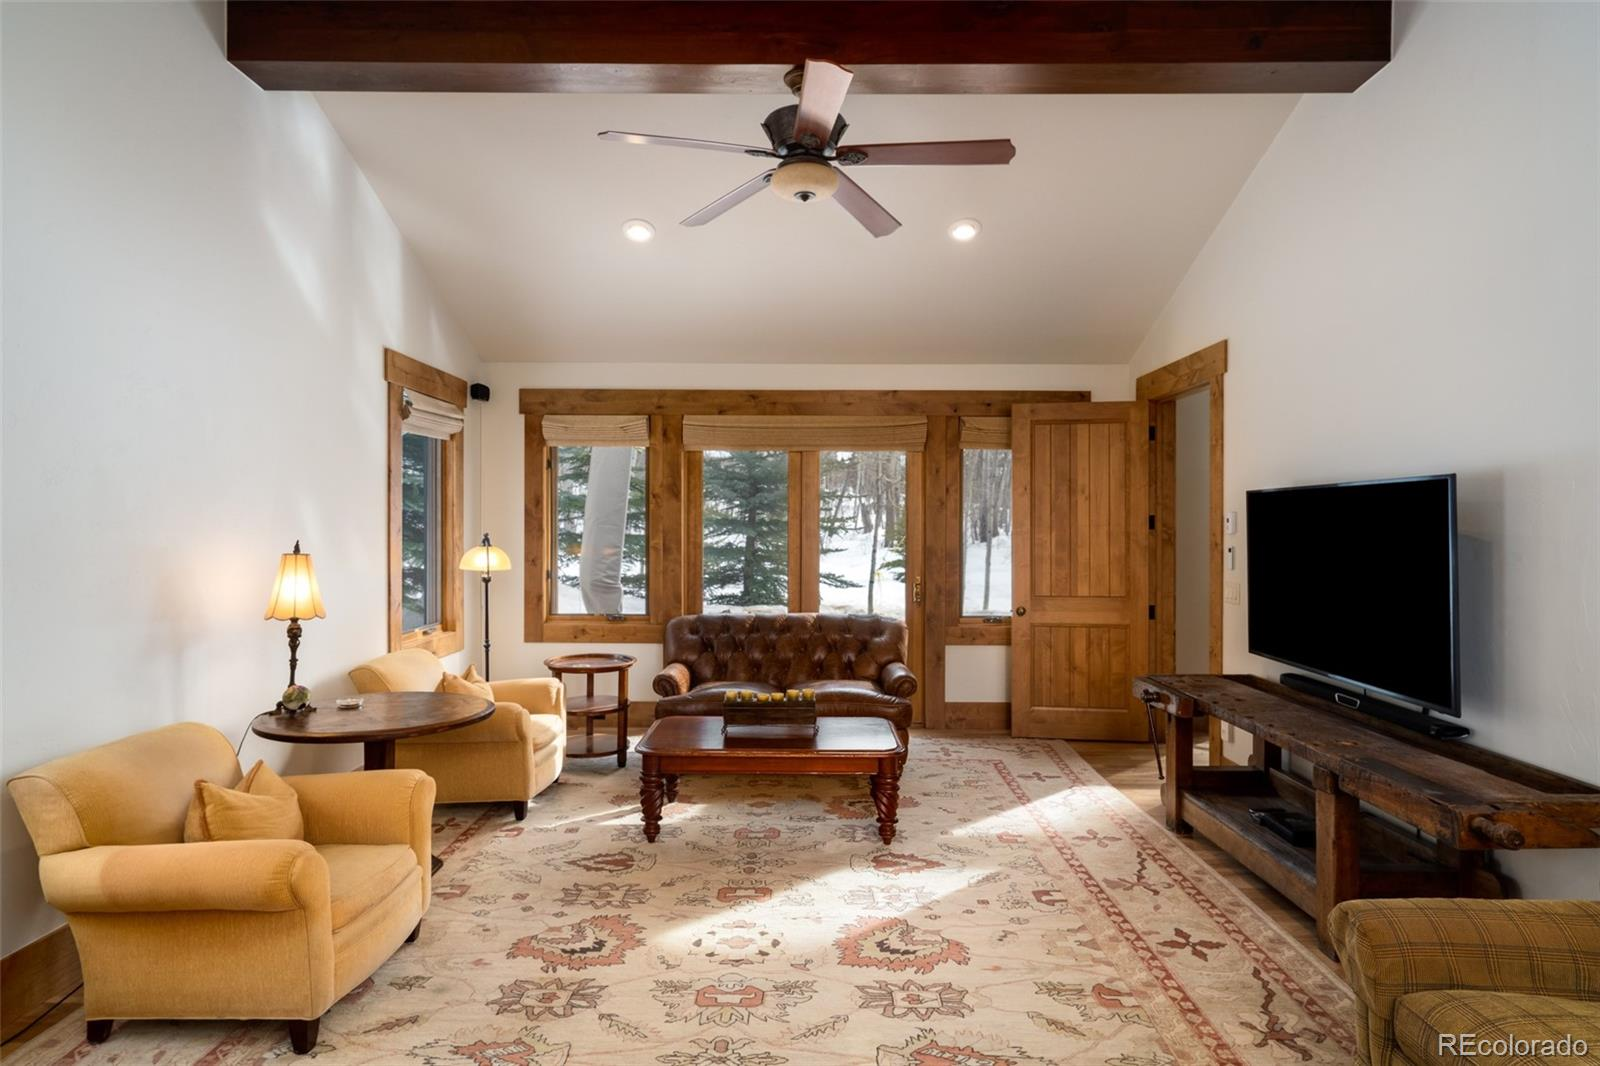 MLS# 4754715 - 12 - 3175 Aspen Wood Lane, Steamboat Springs, CO 80487